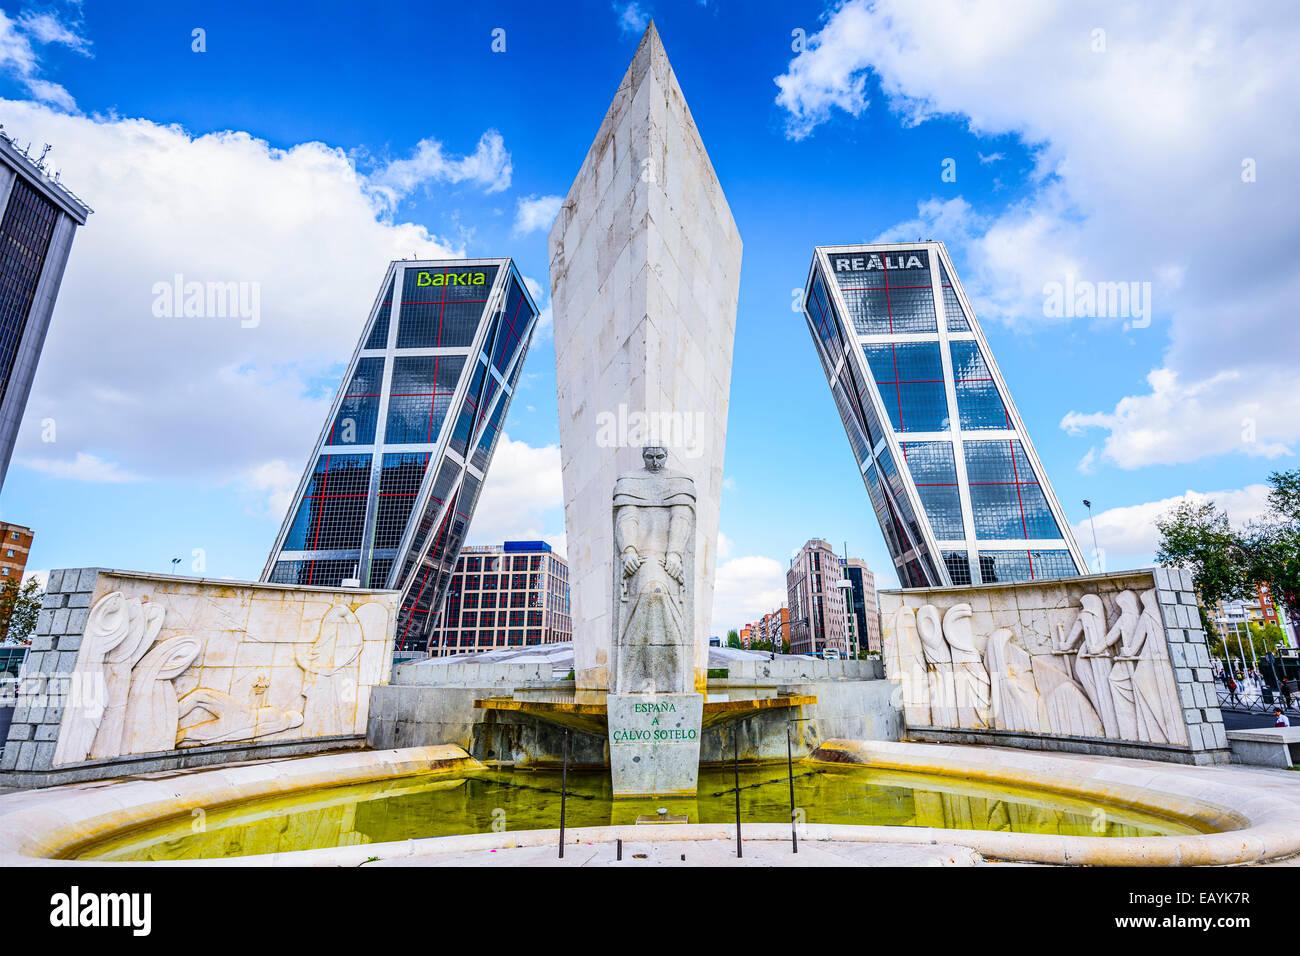 Les tours Puerta de Europa, vue de la Plaza de Castilla. Photo Stock